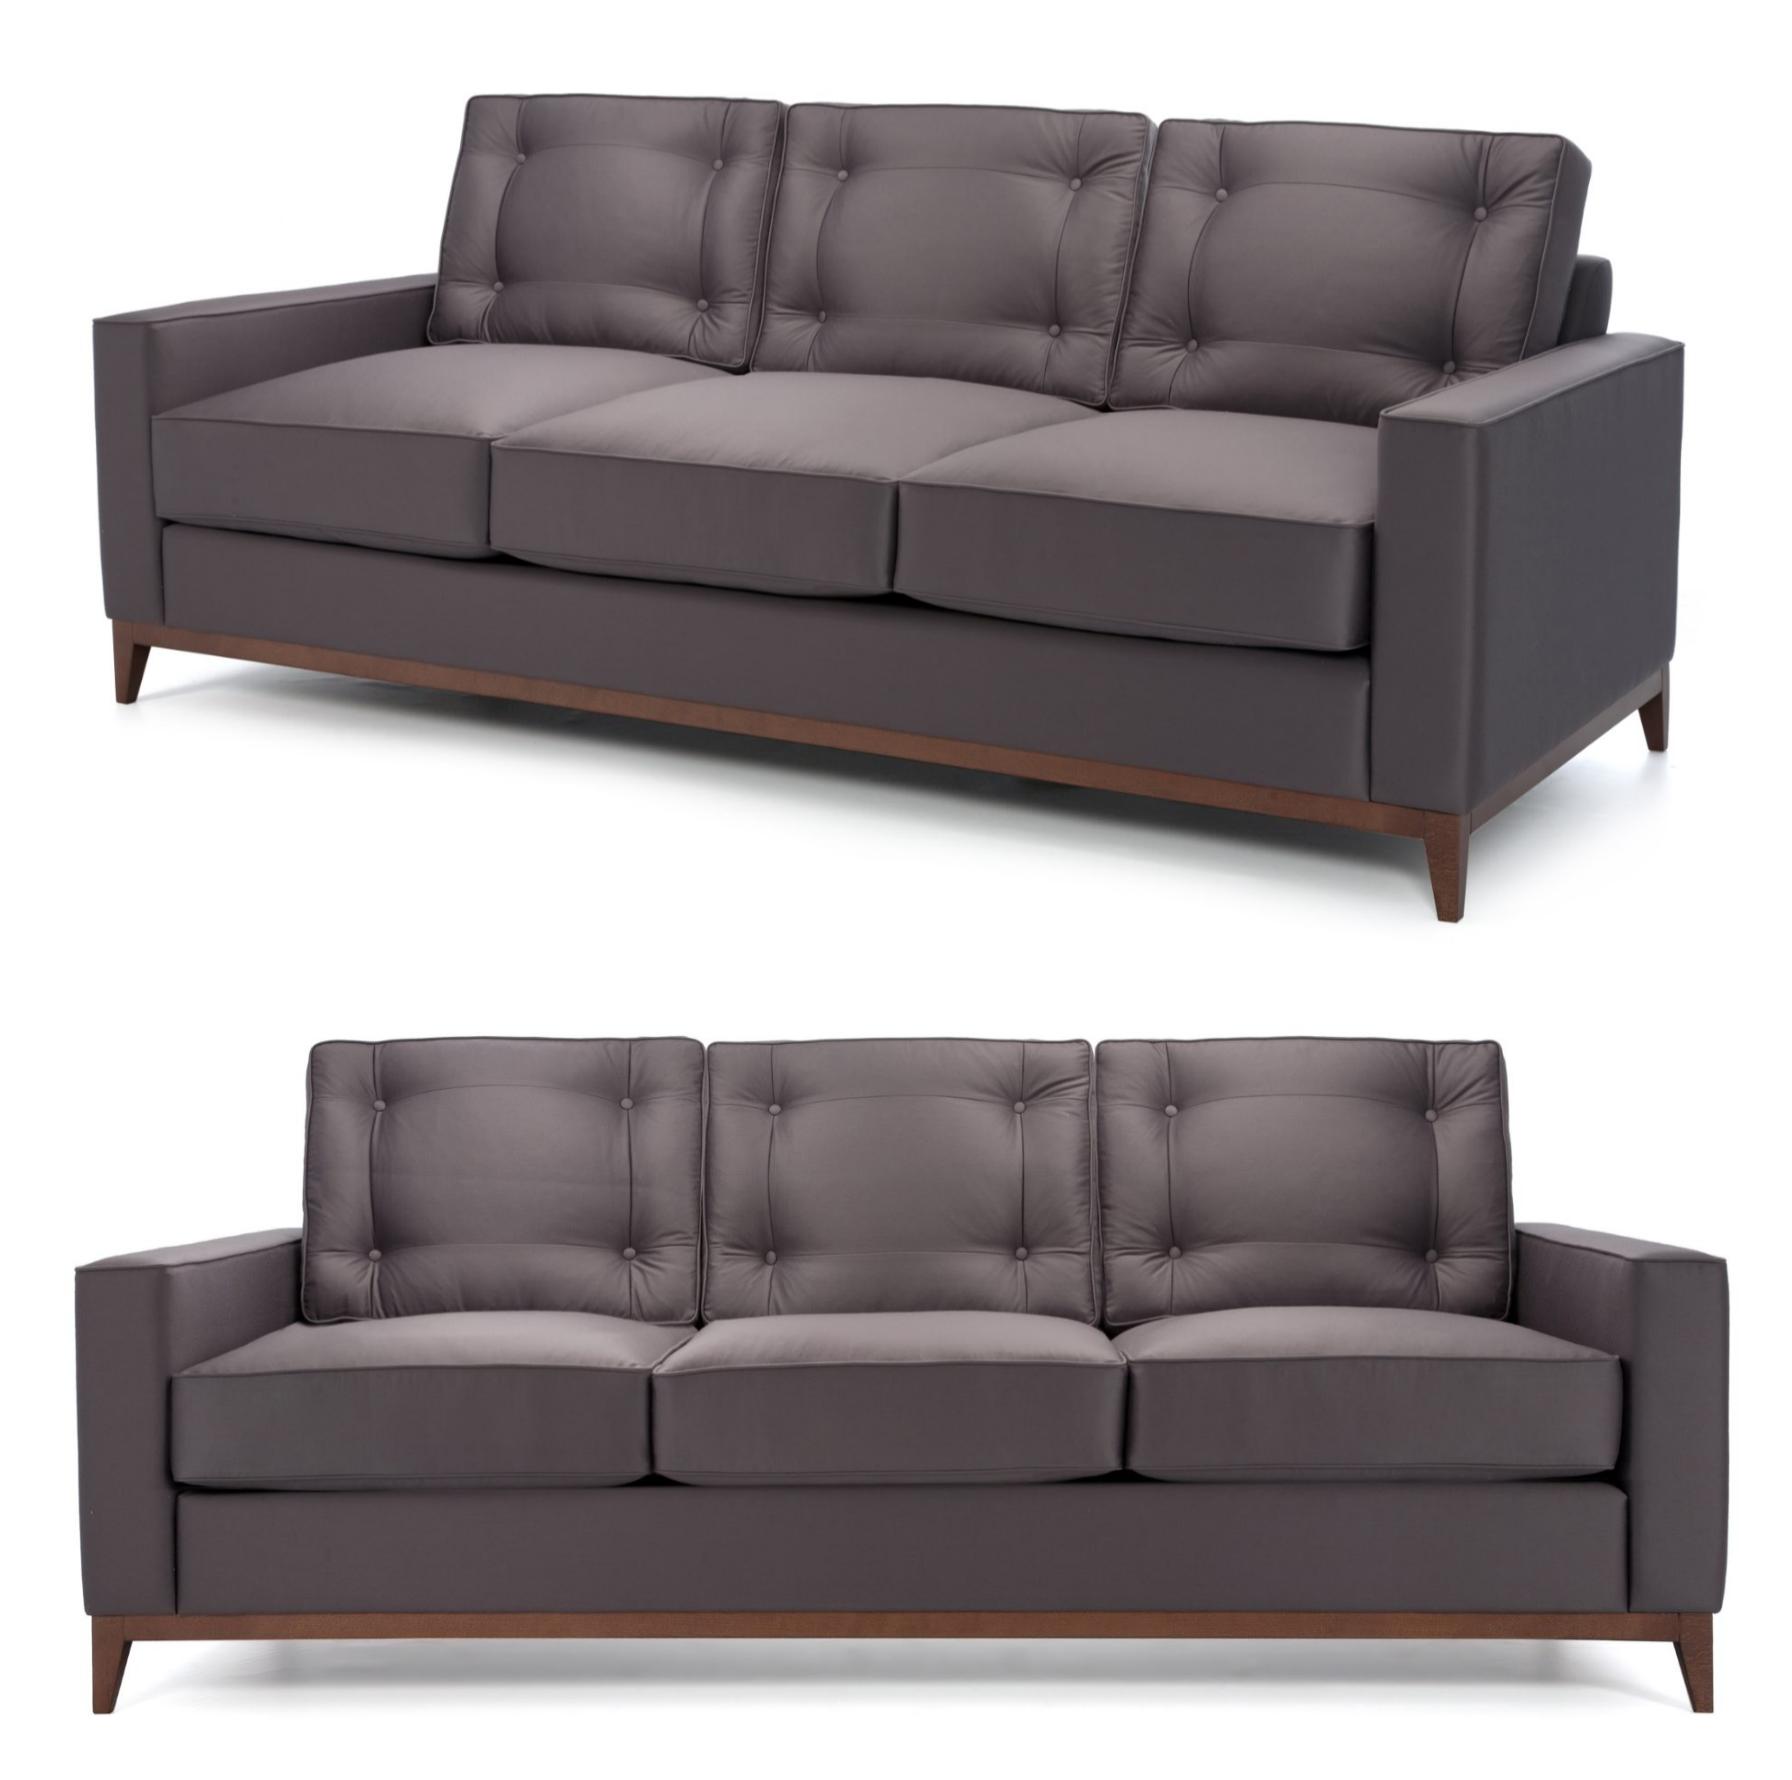 Bespoke Sofas The Sofa Chair Company Interior Inspiration